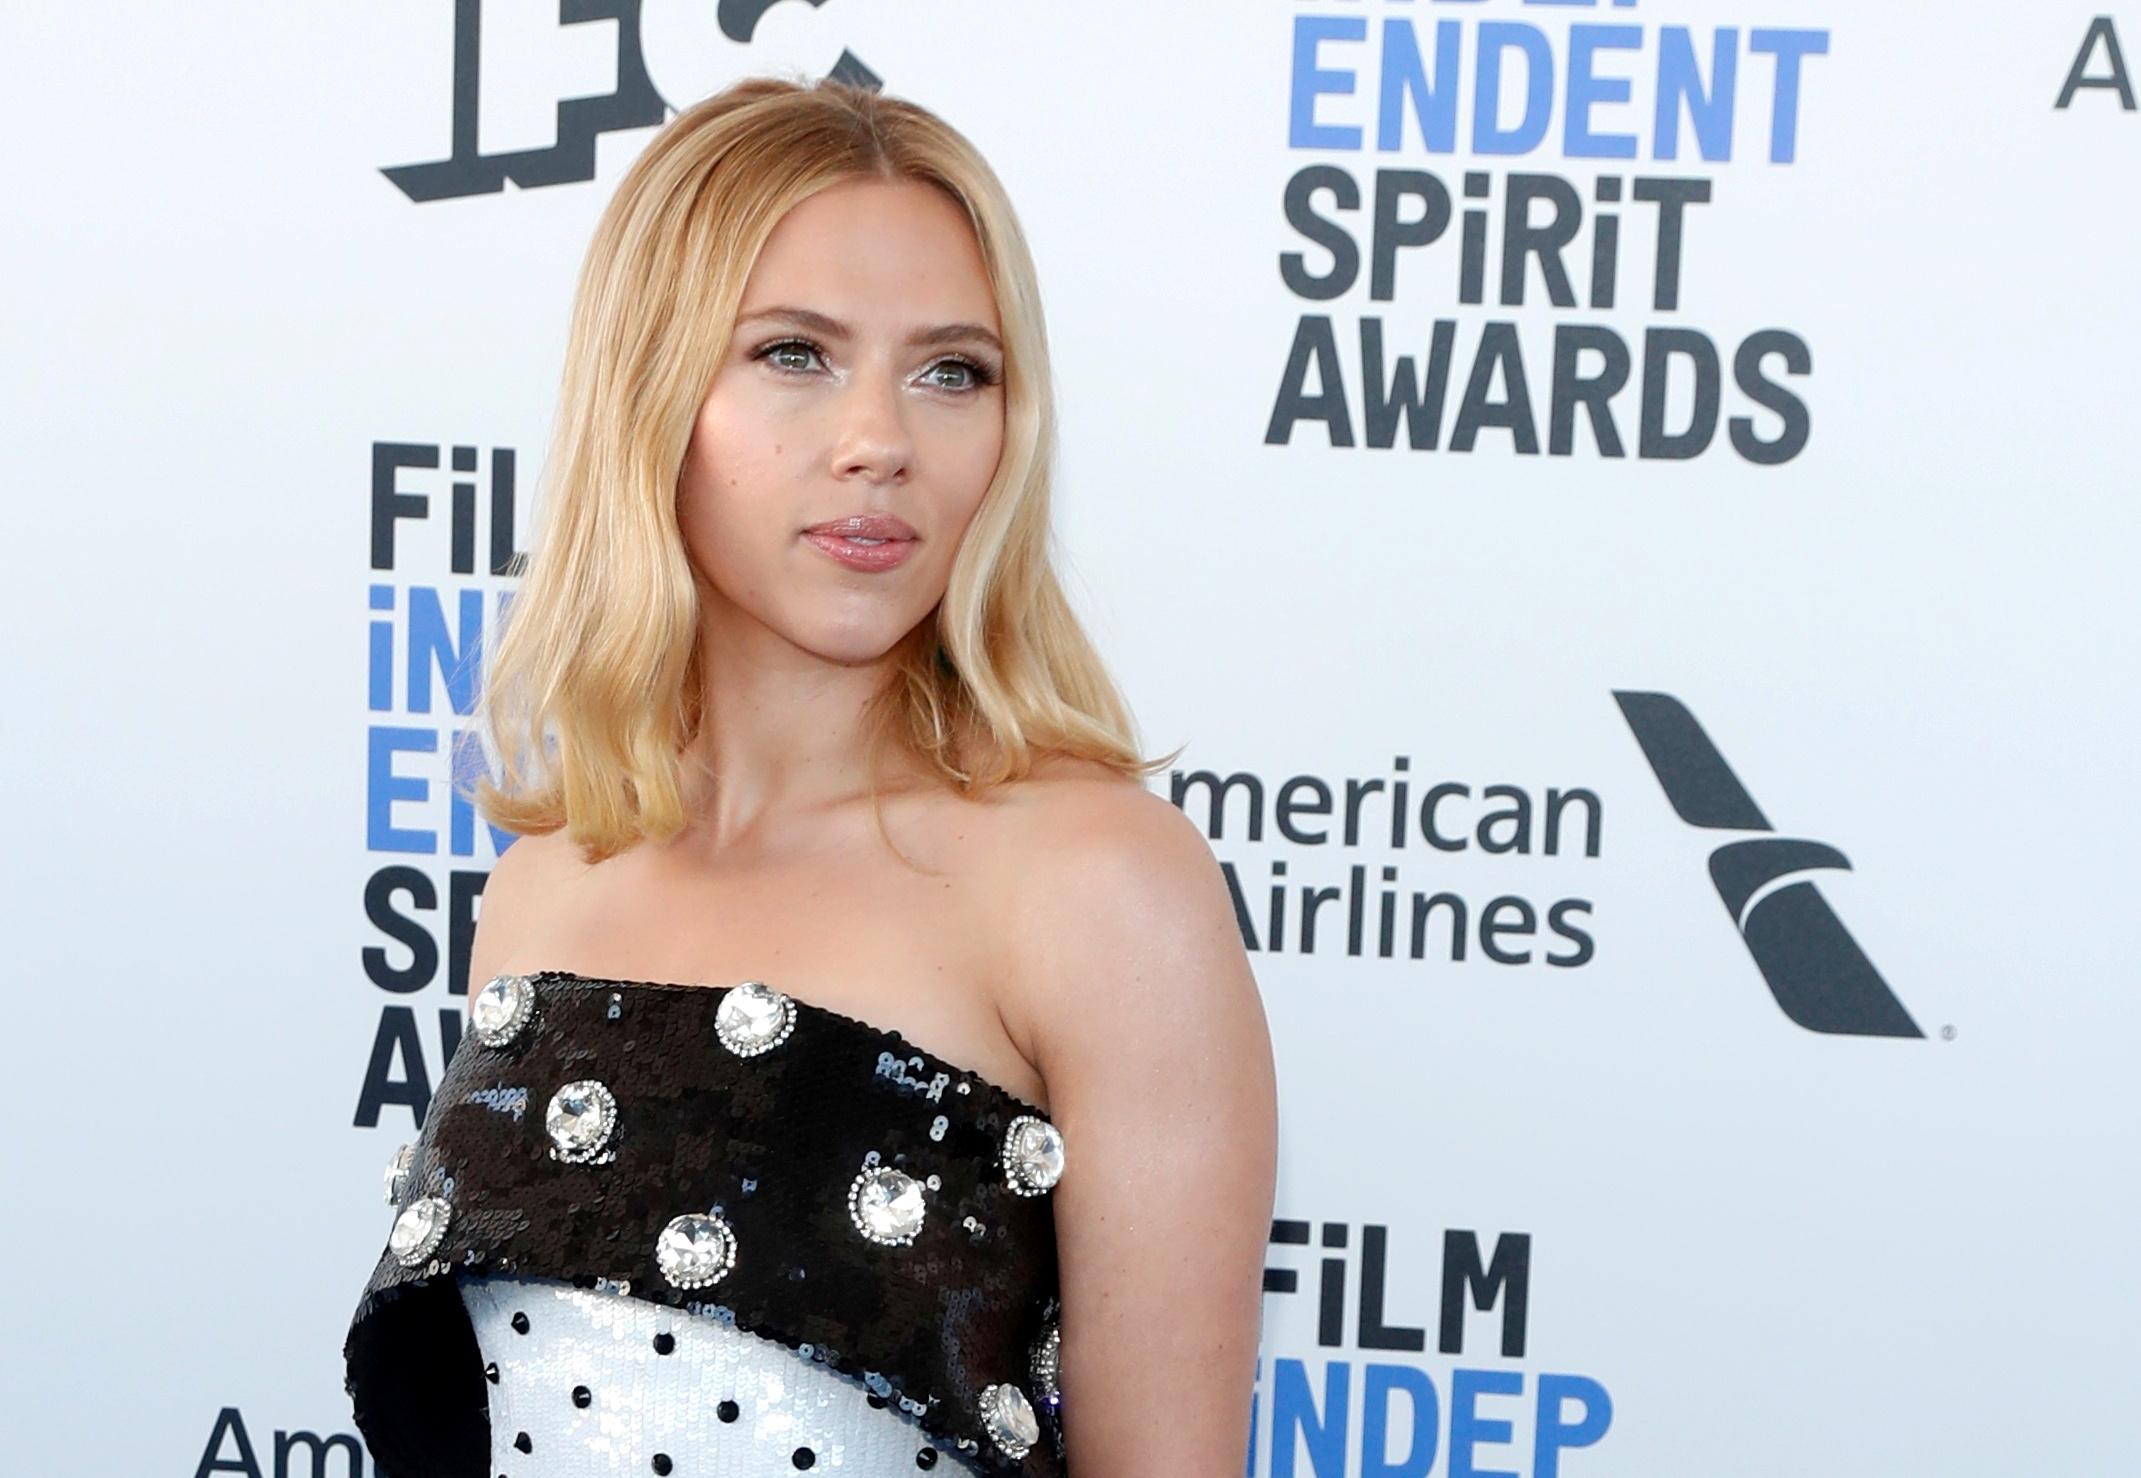 35th Film Independent Spirit Awards – Arrivals – Santa Monica, California, U.S., February 8, 2020 – Scarlett Johansson. REUTERS/Lucas Jackson/File Photo